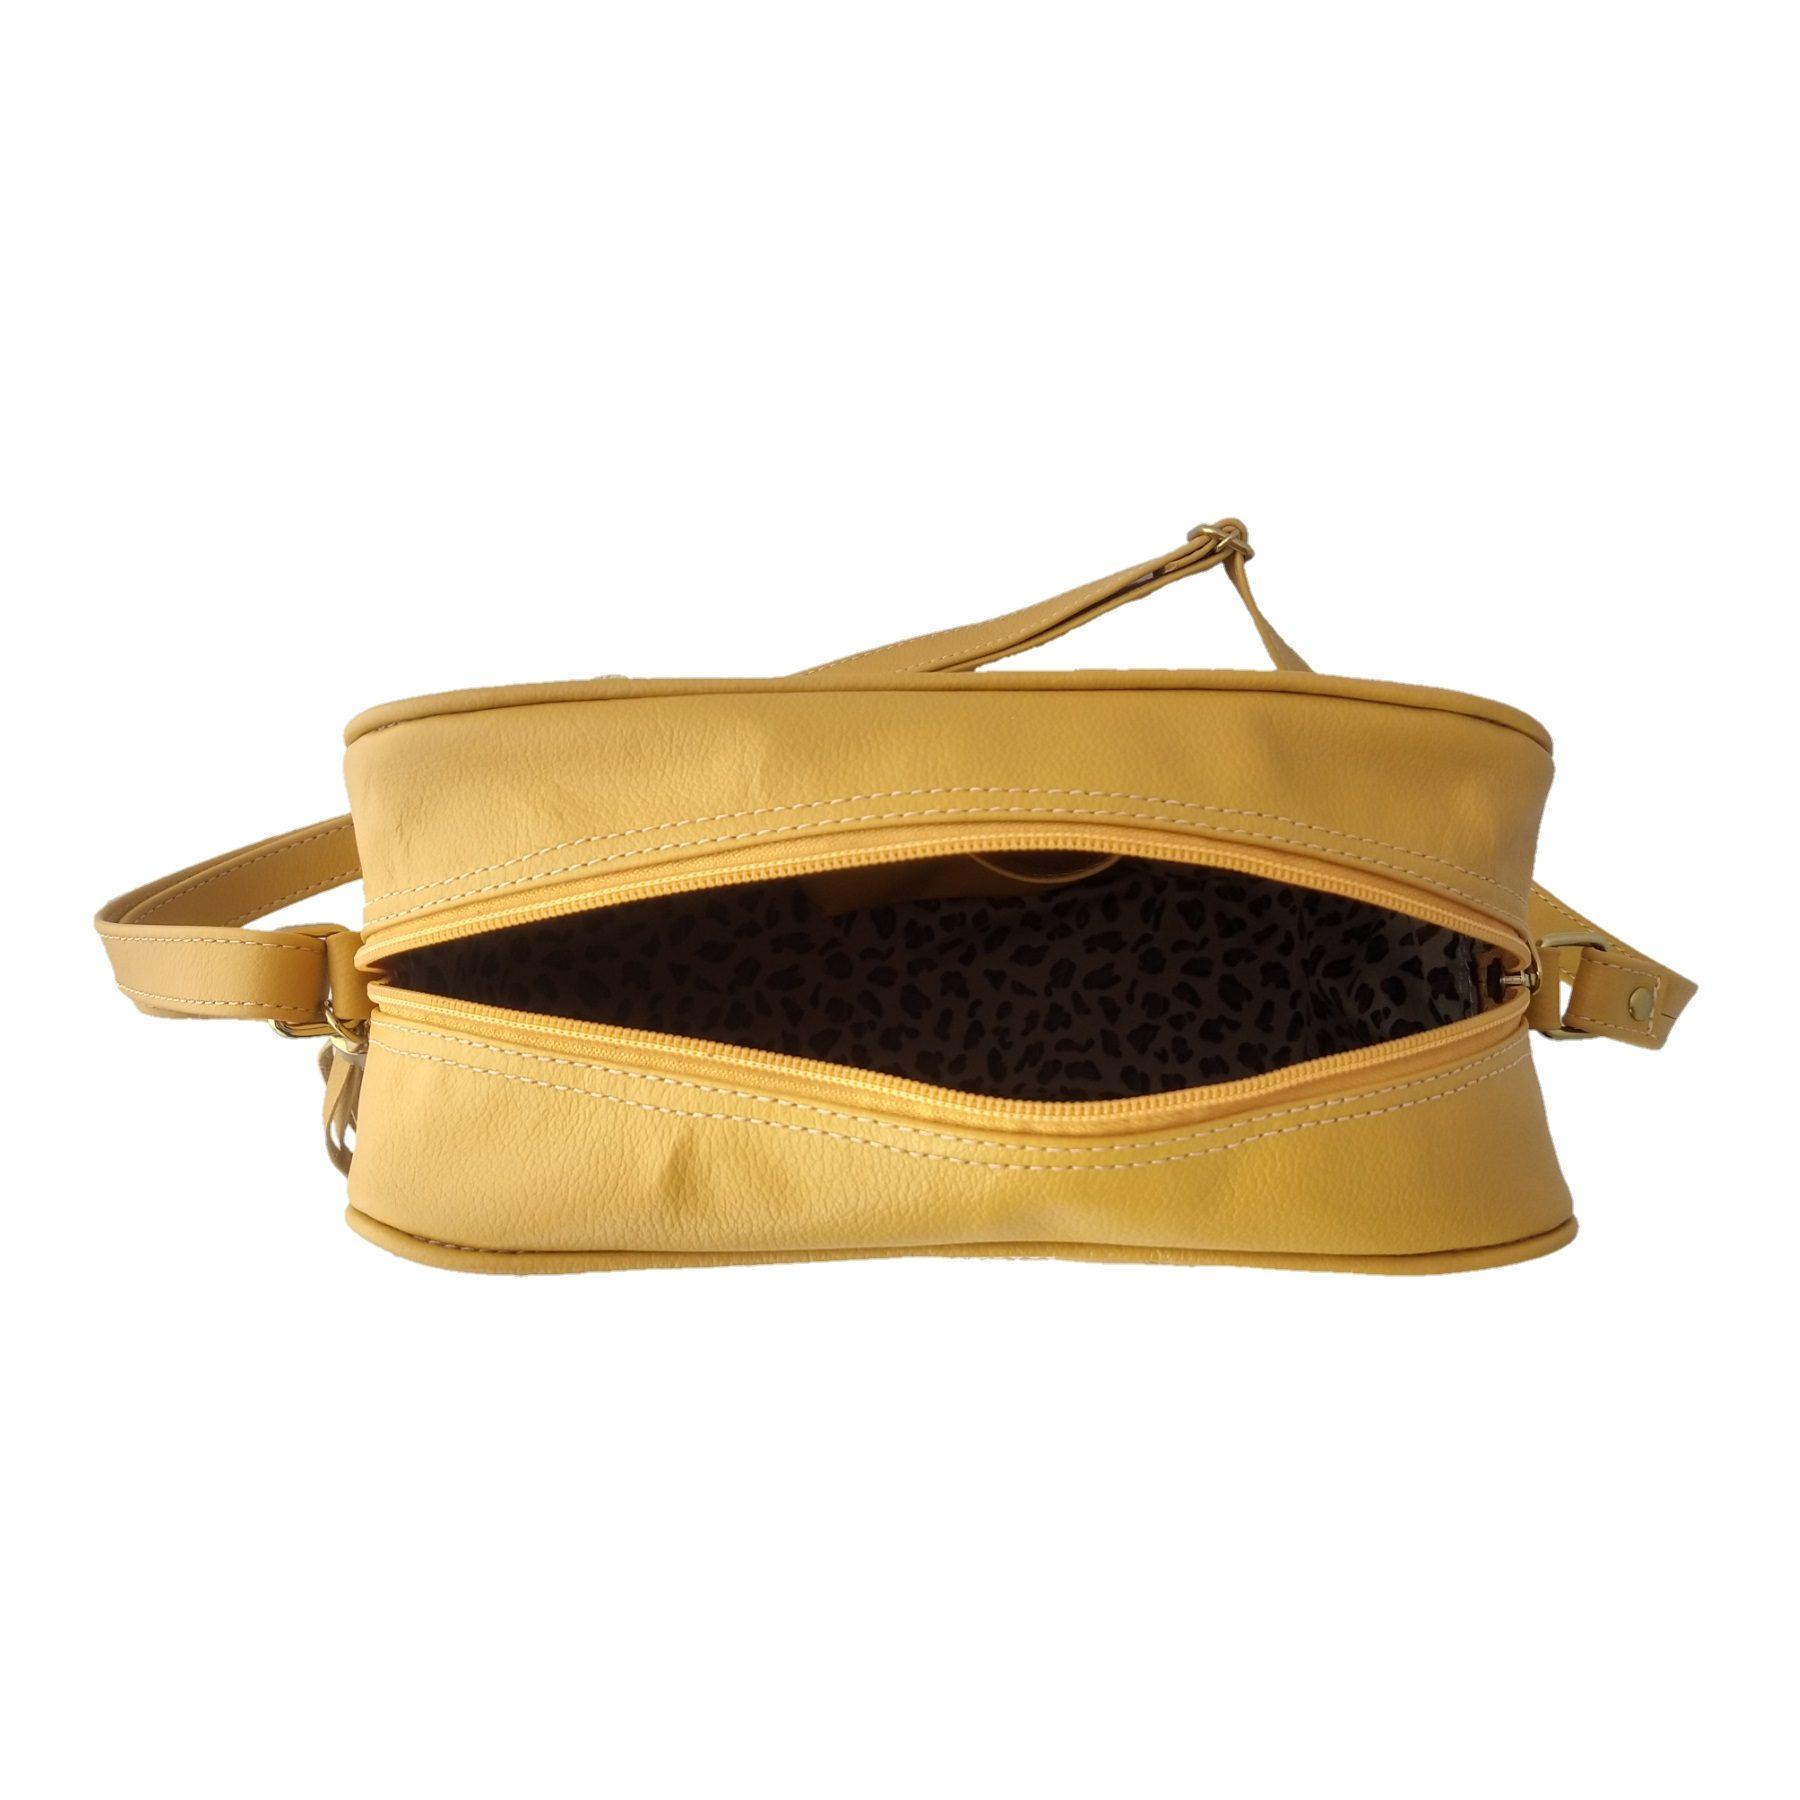 Bolsa Transversal TopGrife Matelassê Couro Amarelo  - SAPATOWEB.COM